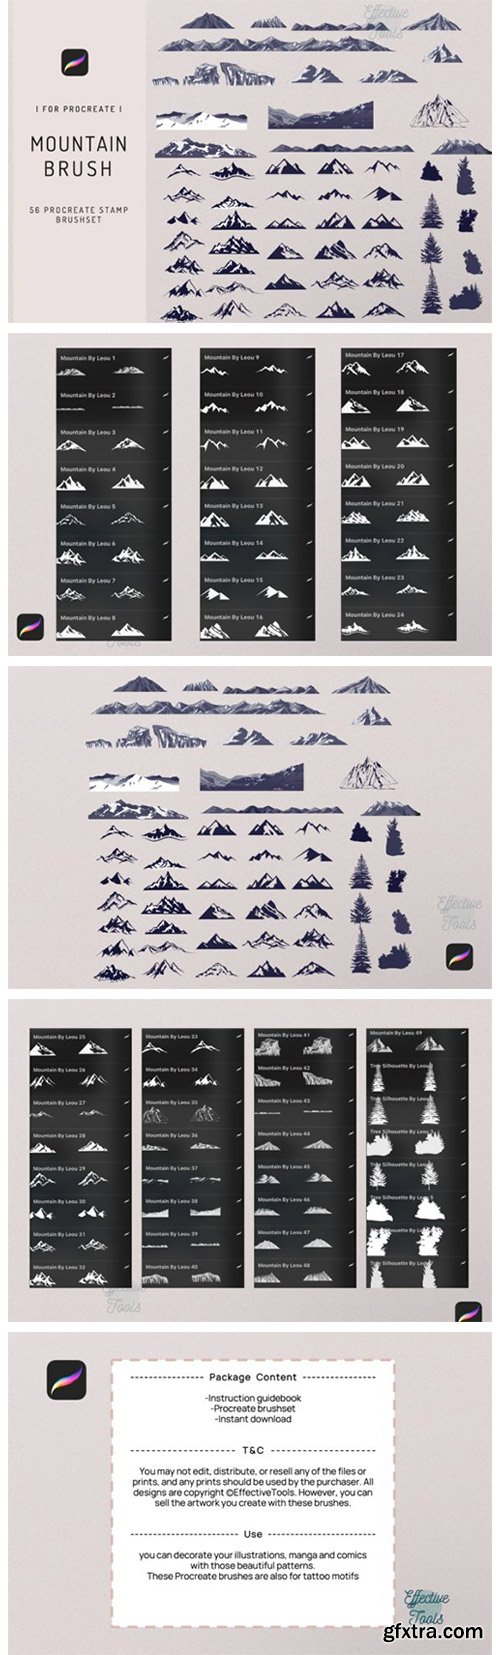 56 Procreate Mountain Stamp Brush 7720256